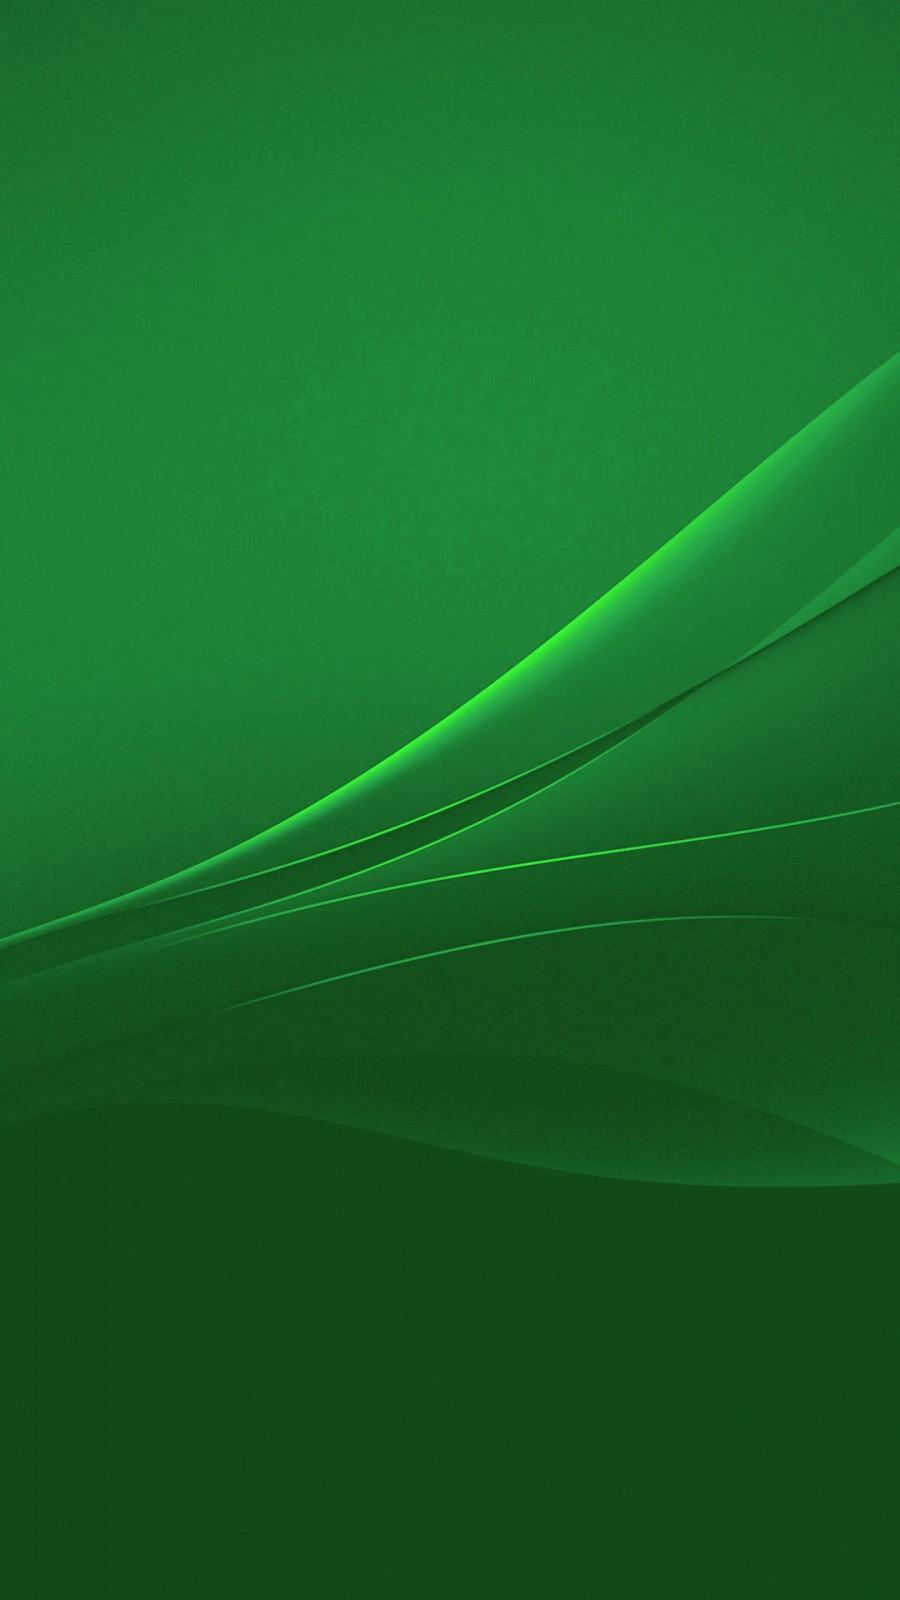 Green Xperia Lollipop Experience Flow Wallpaper — Gizmo ...  Green Xperia Lo...